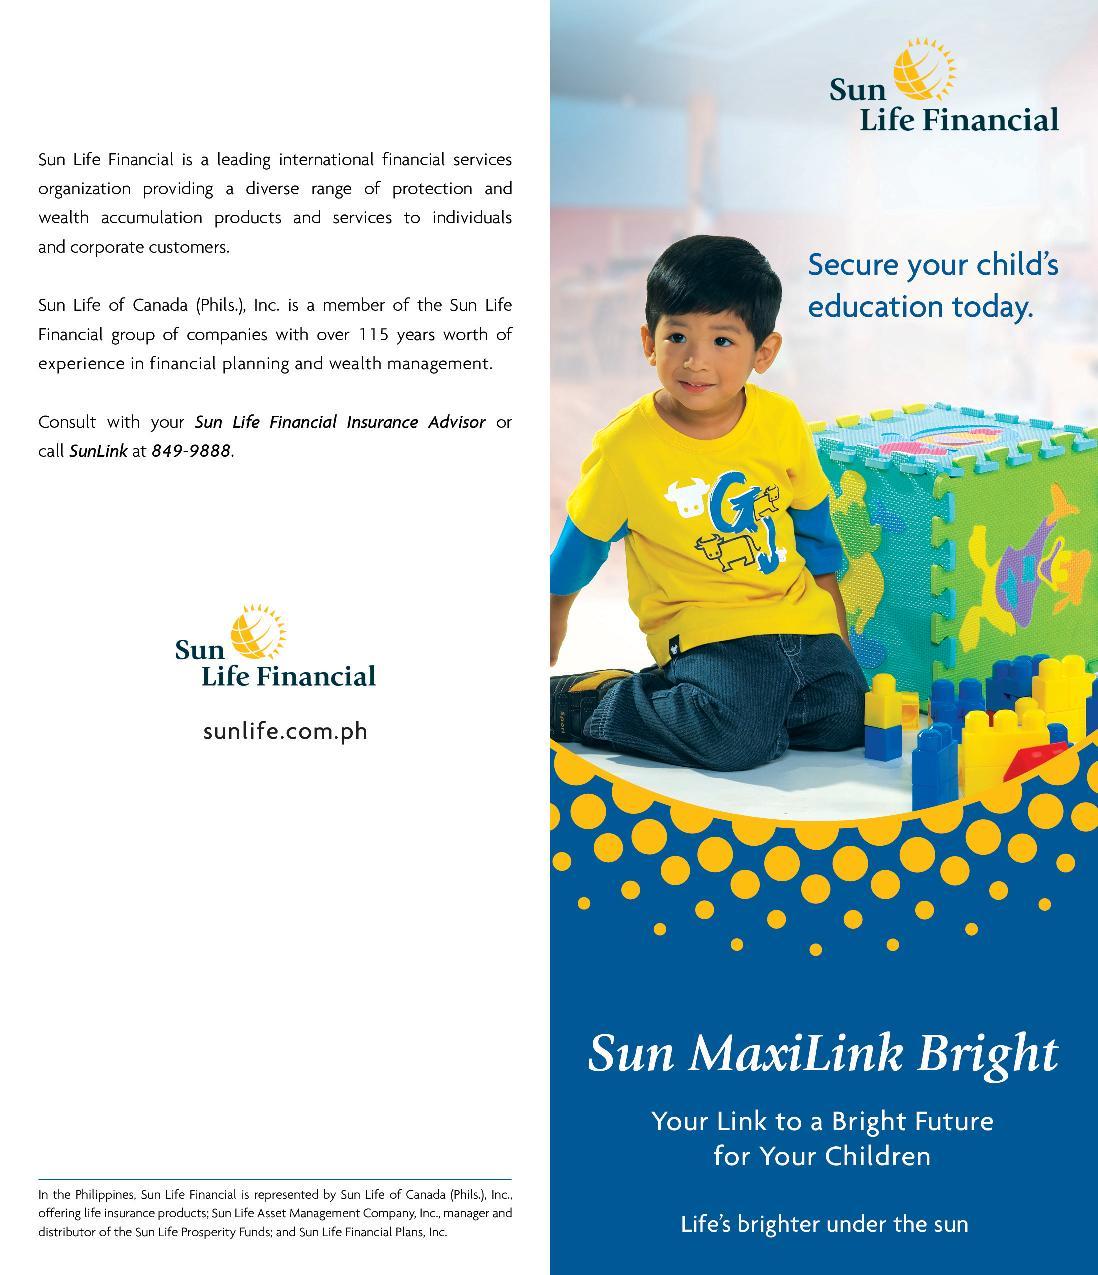 sun maxilink bright (1)